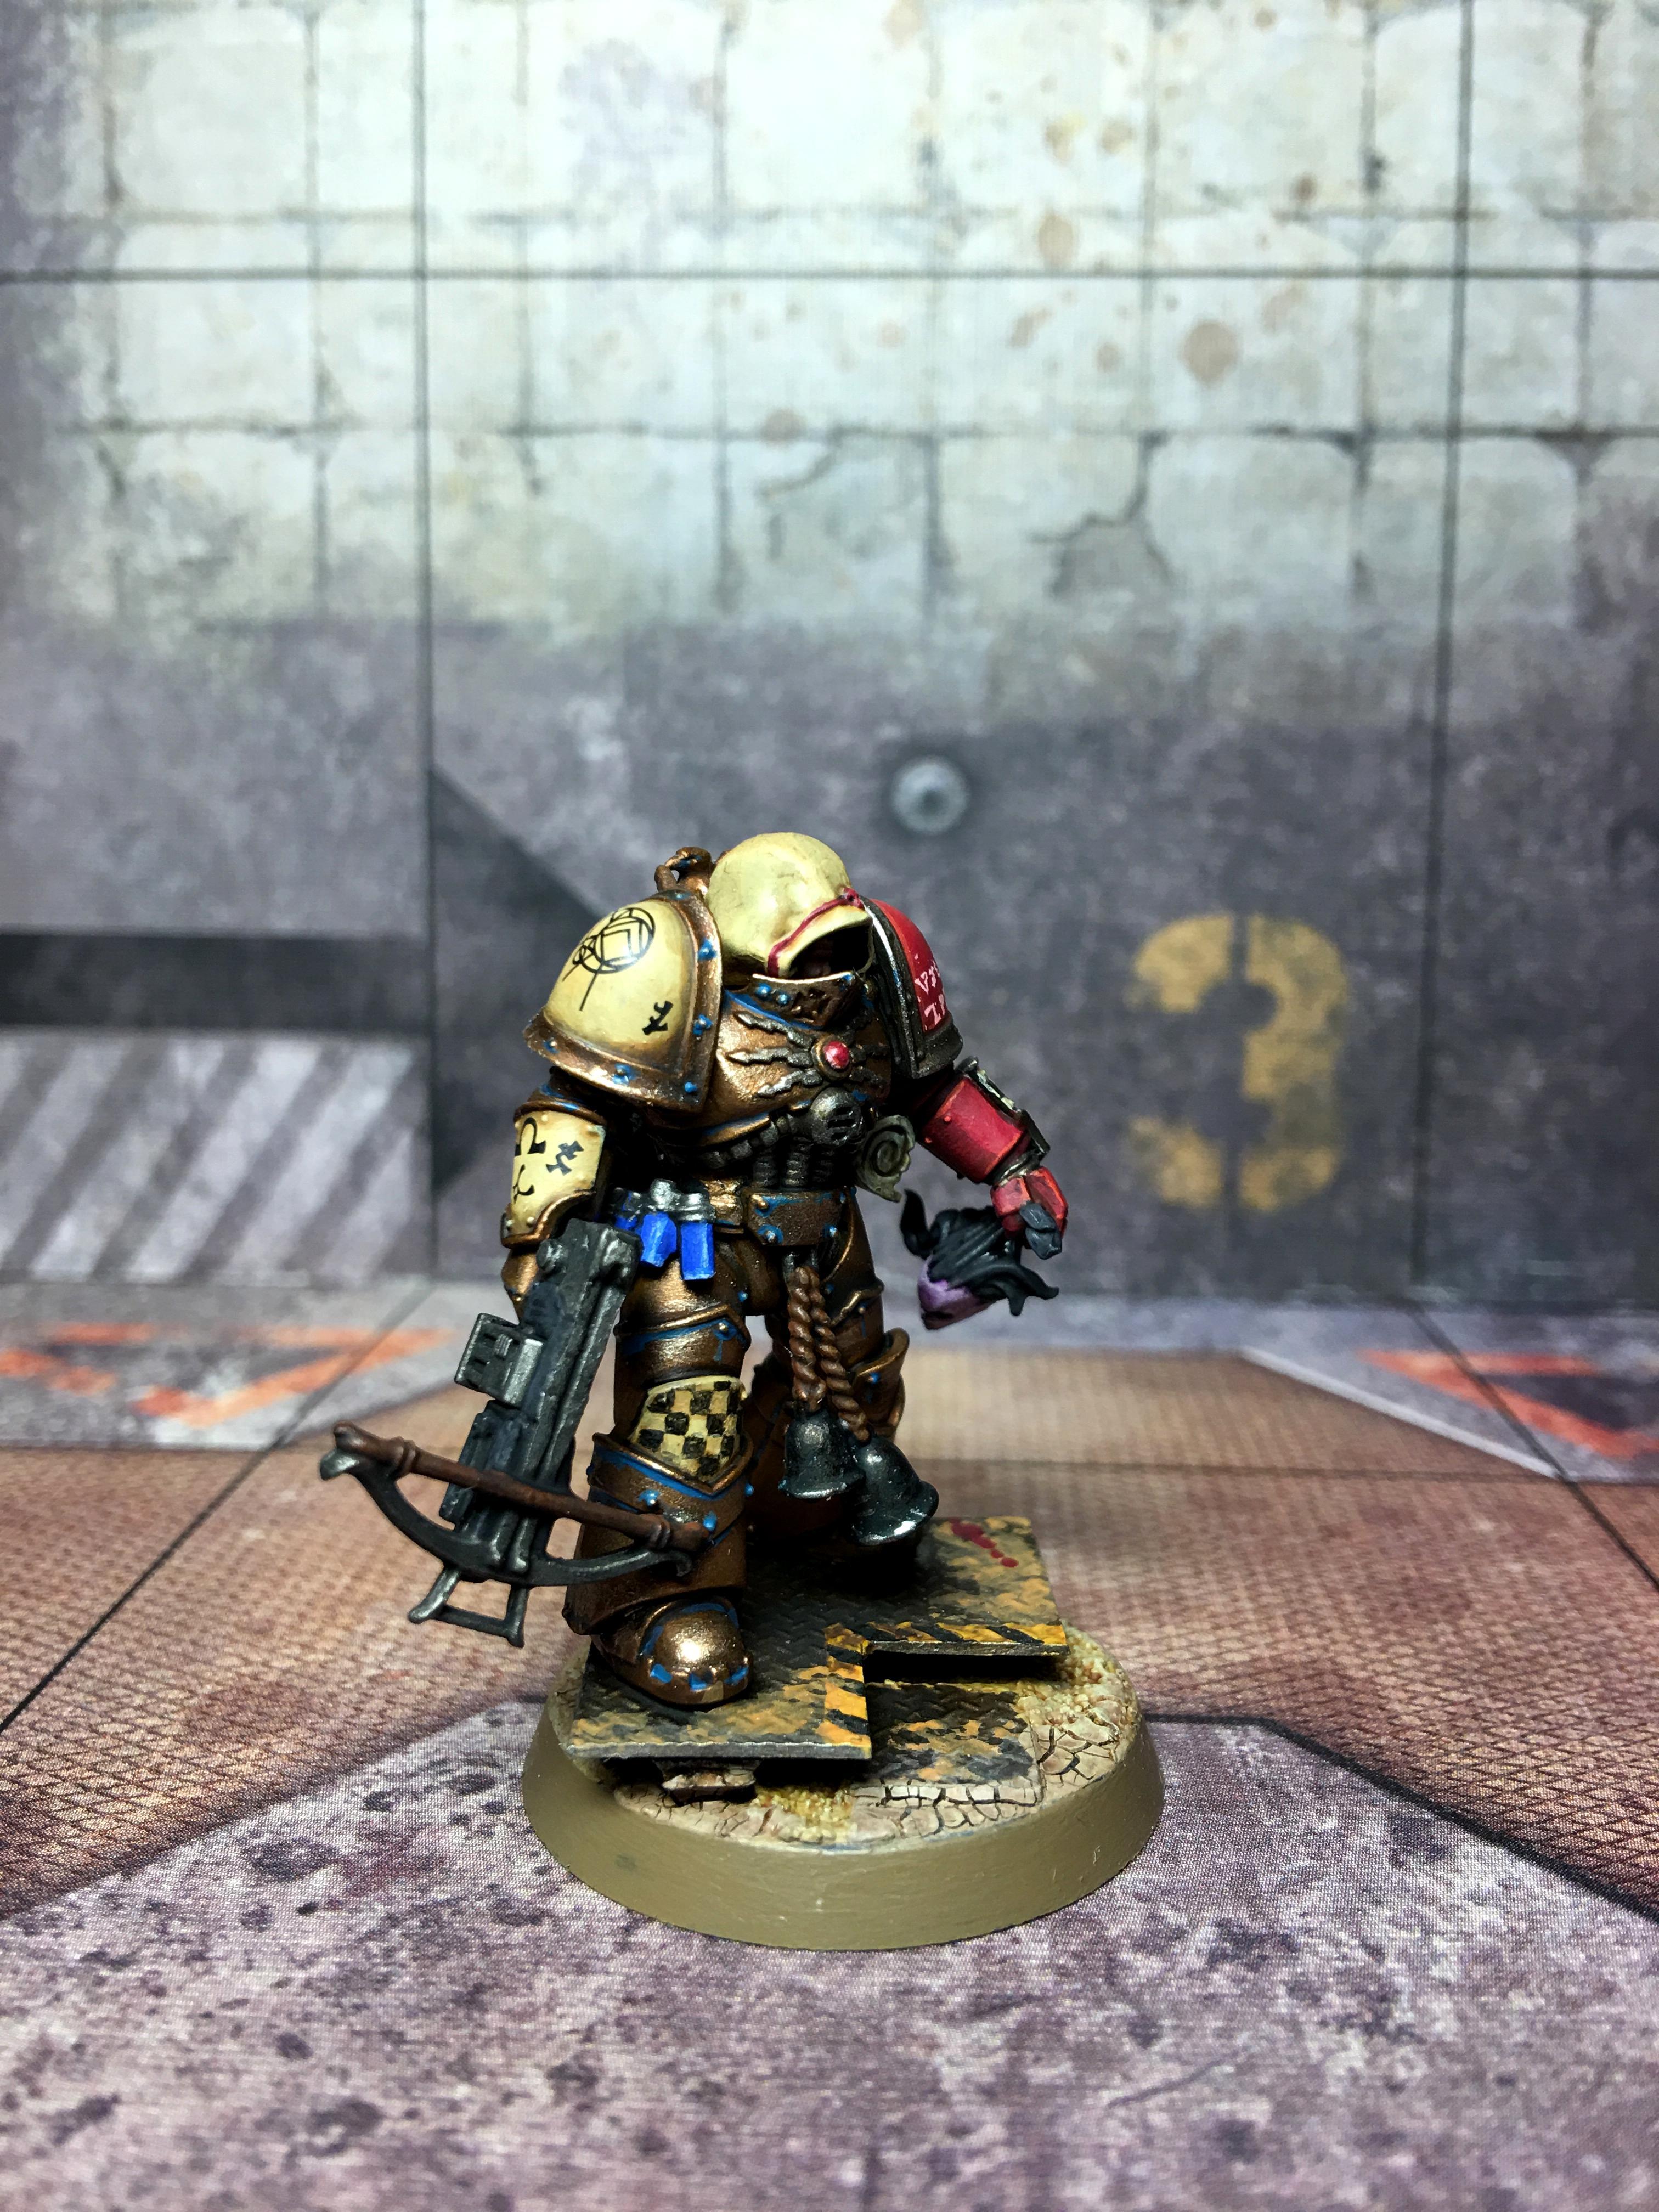 Daemonhunters, Inquisition, Inquisitor, Space Marines, True Scale Inquisitor, Warhammer 40,000